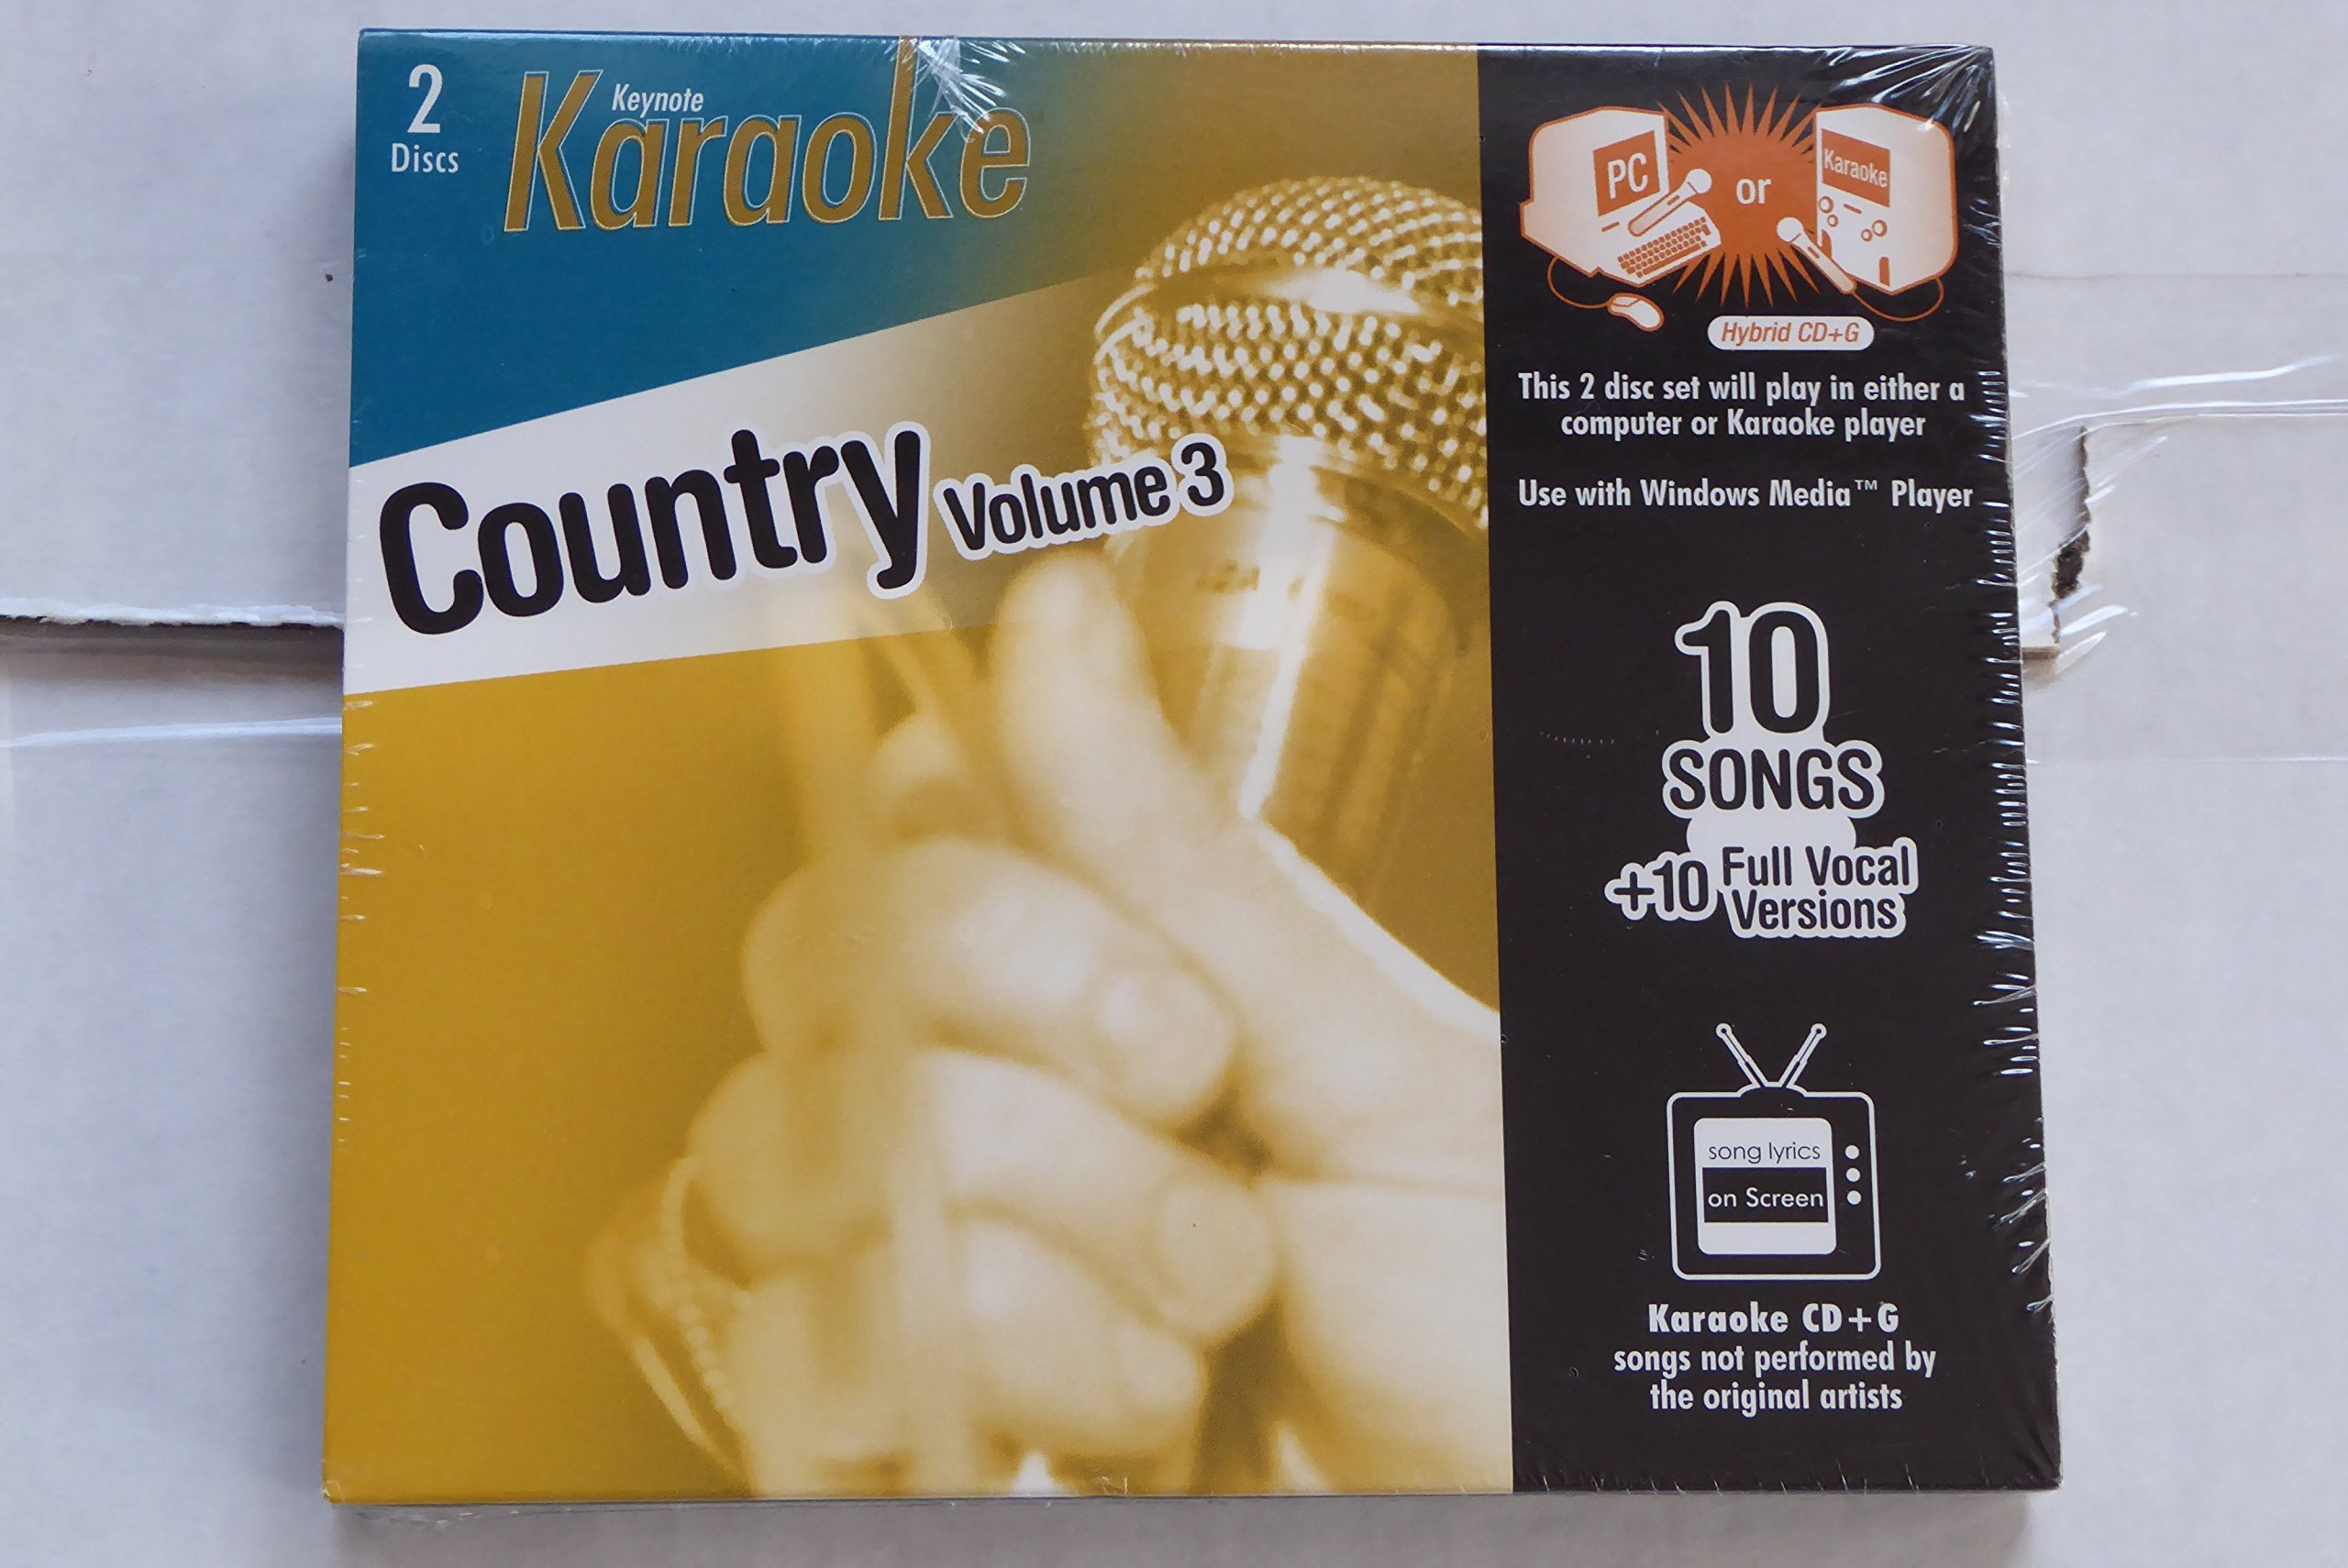 Keynote Karaoke Hybrid: Country 3